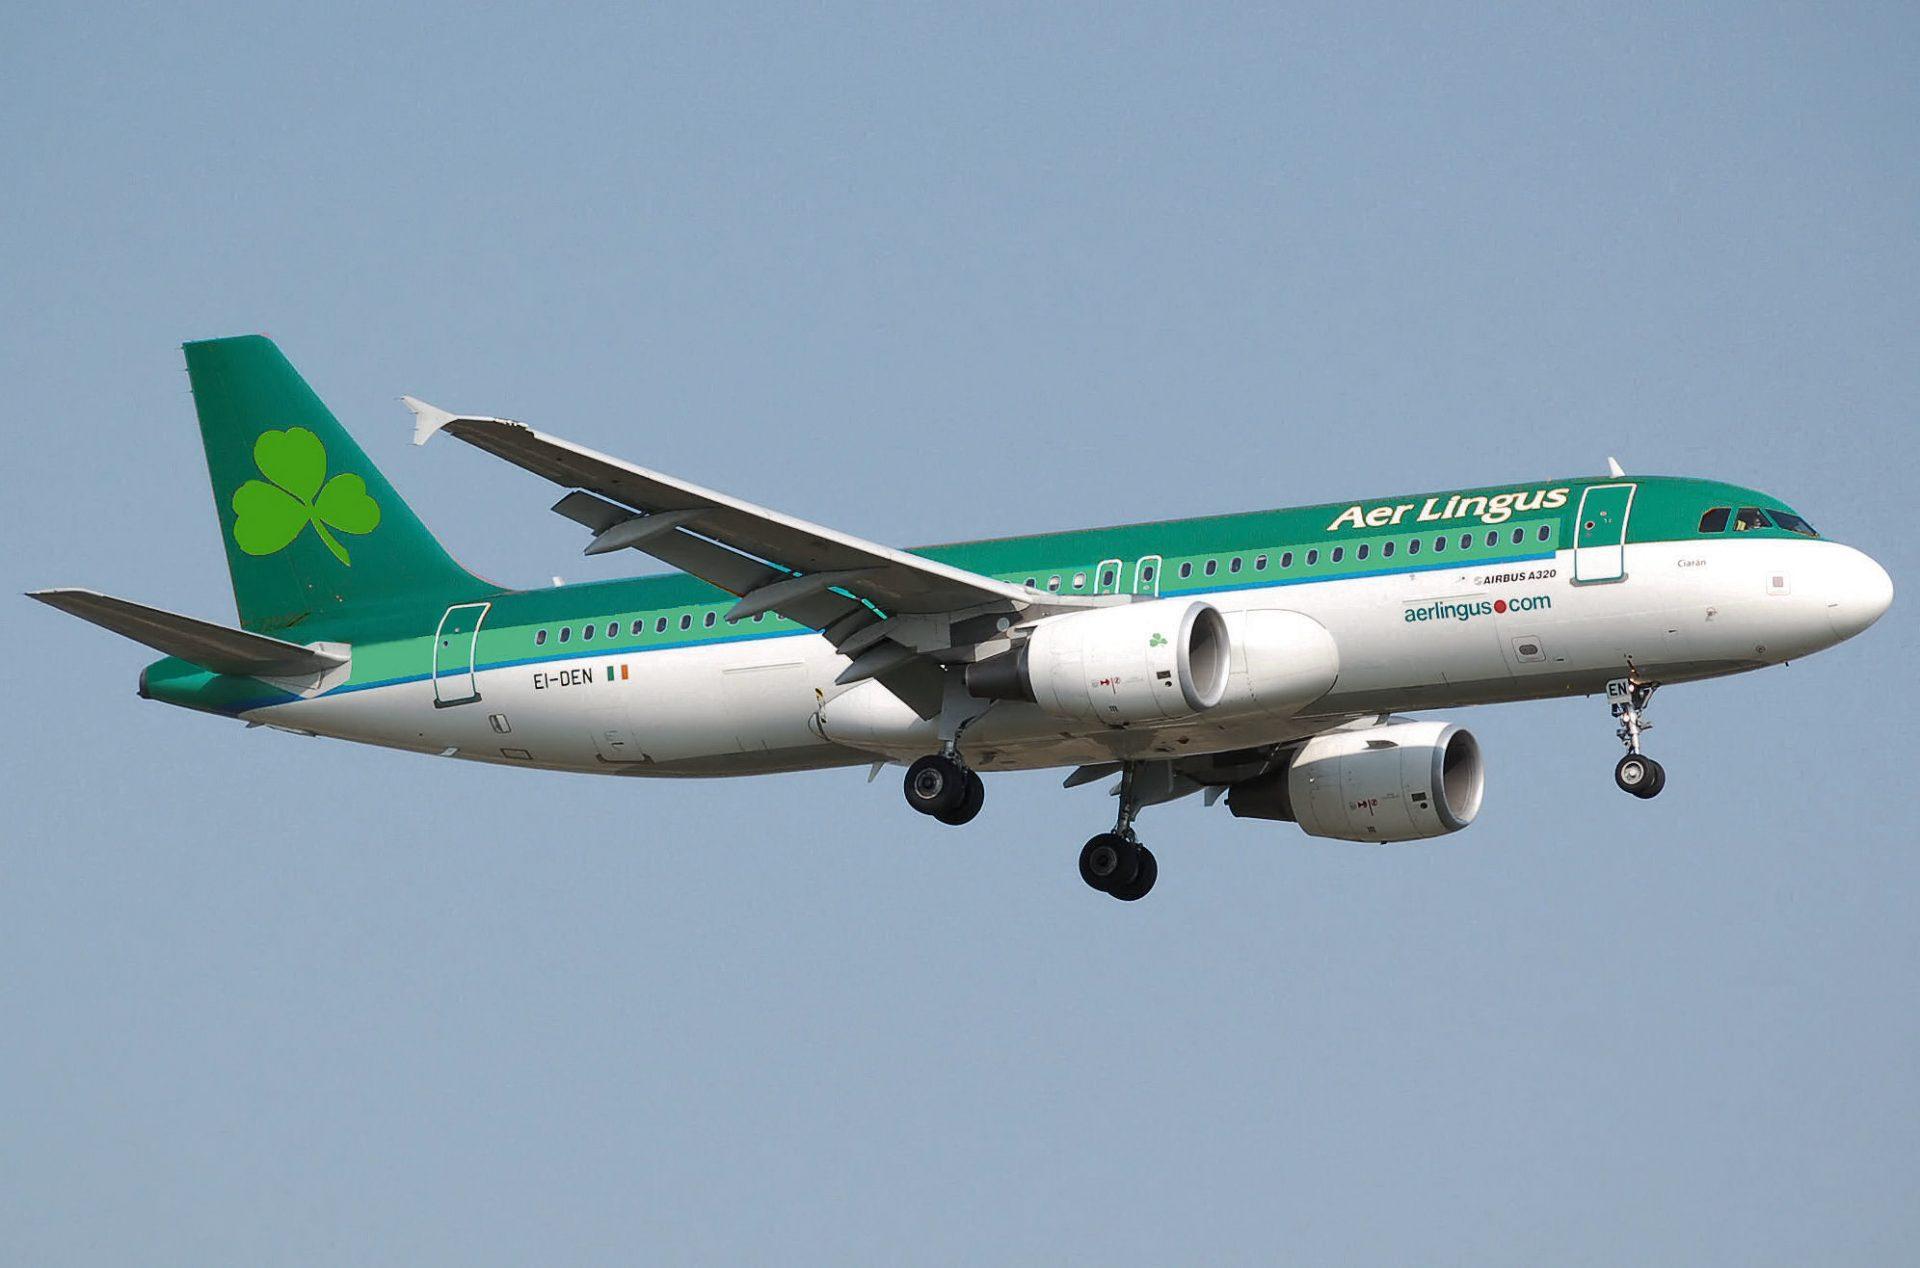 Man bites airline passenger, then dies on Aer Lingus